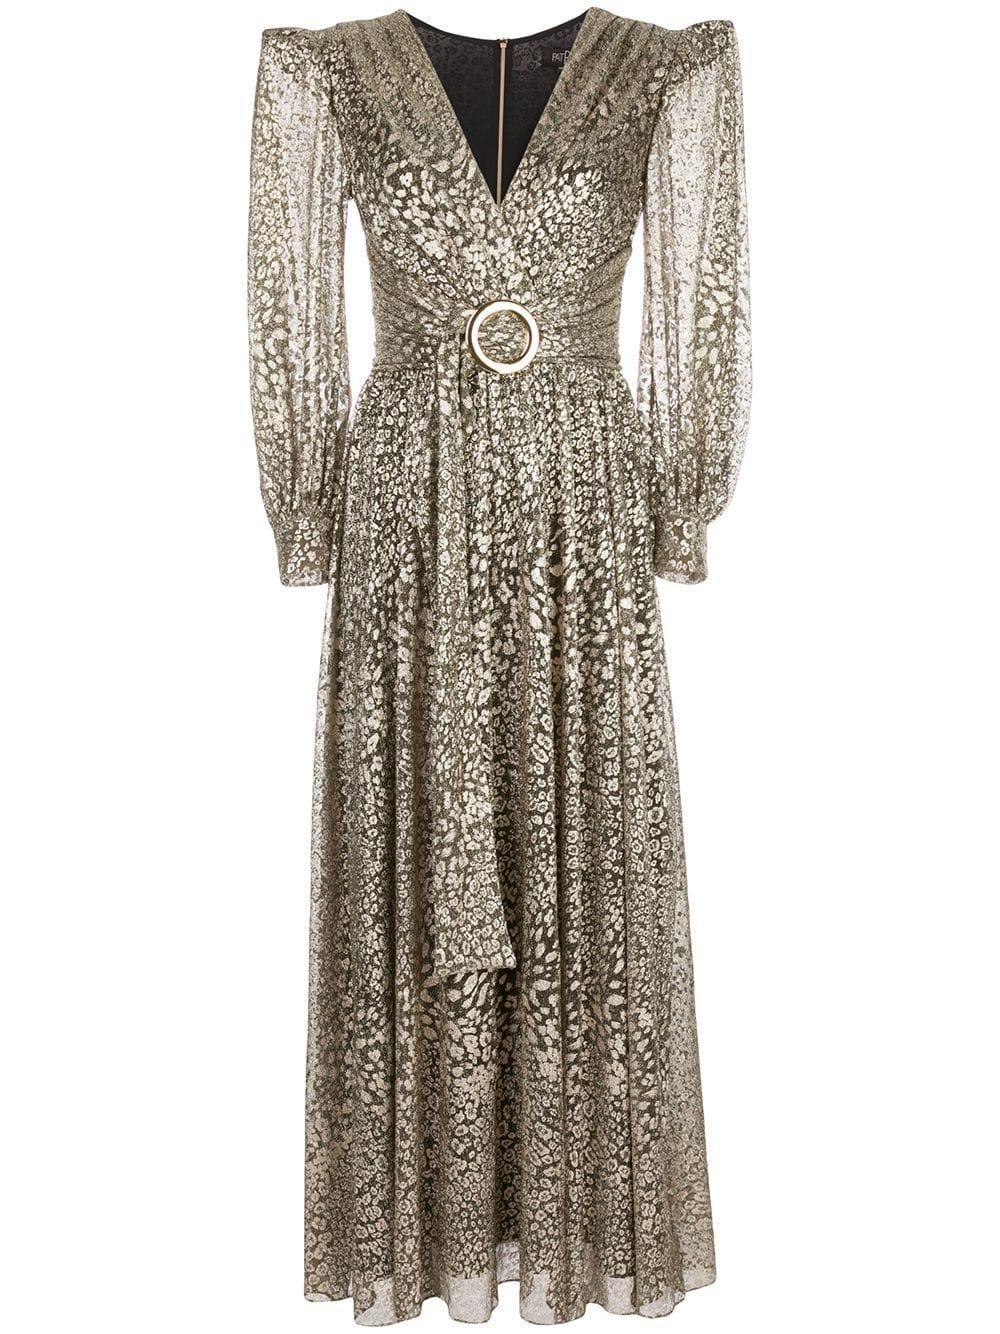 Metallic Leopard Belted Maxi Dress Item # VES2428US